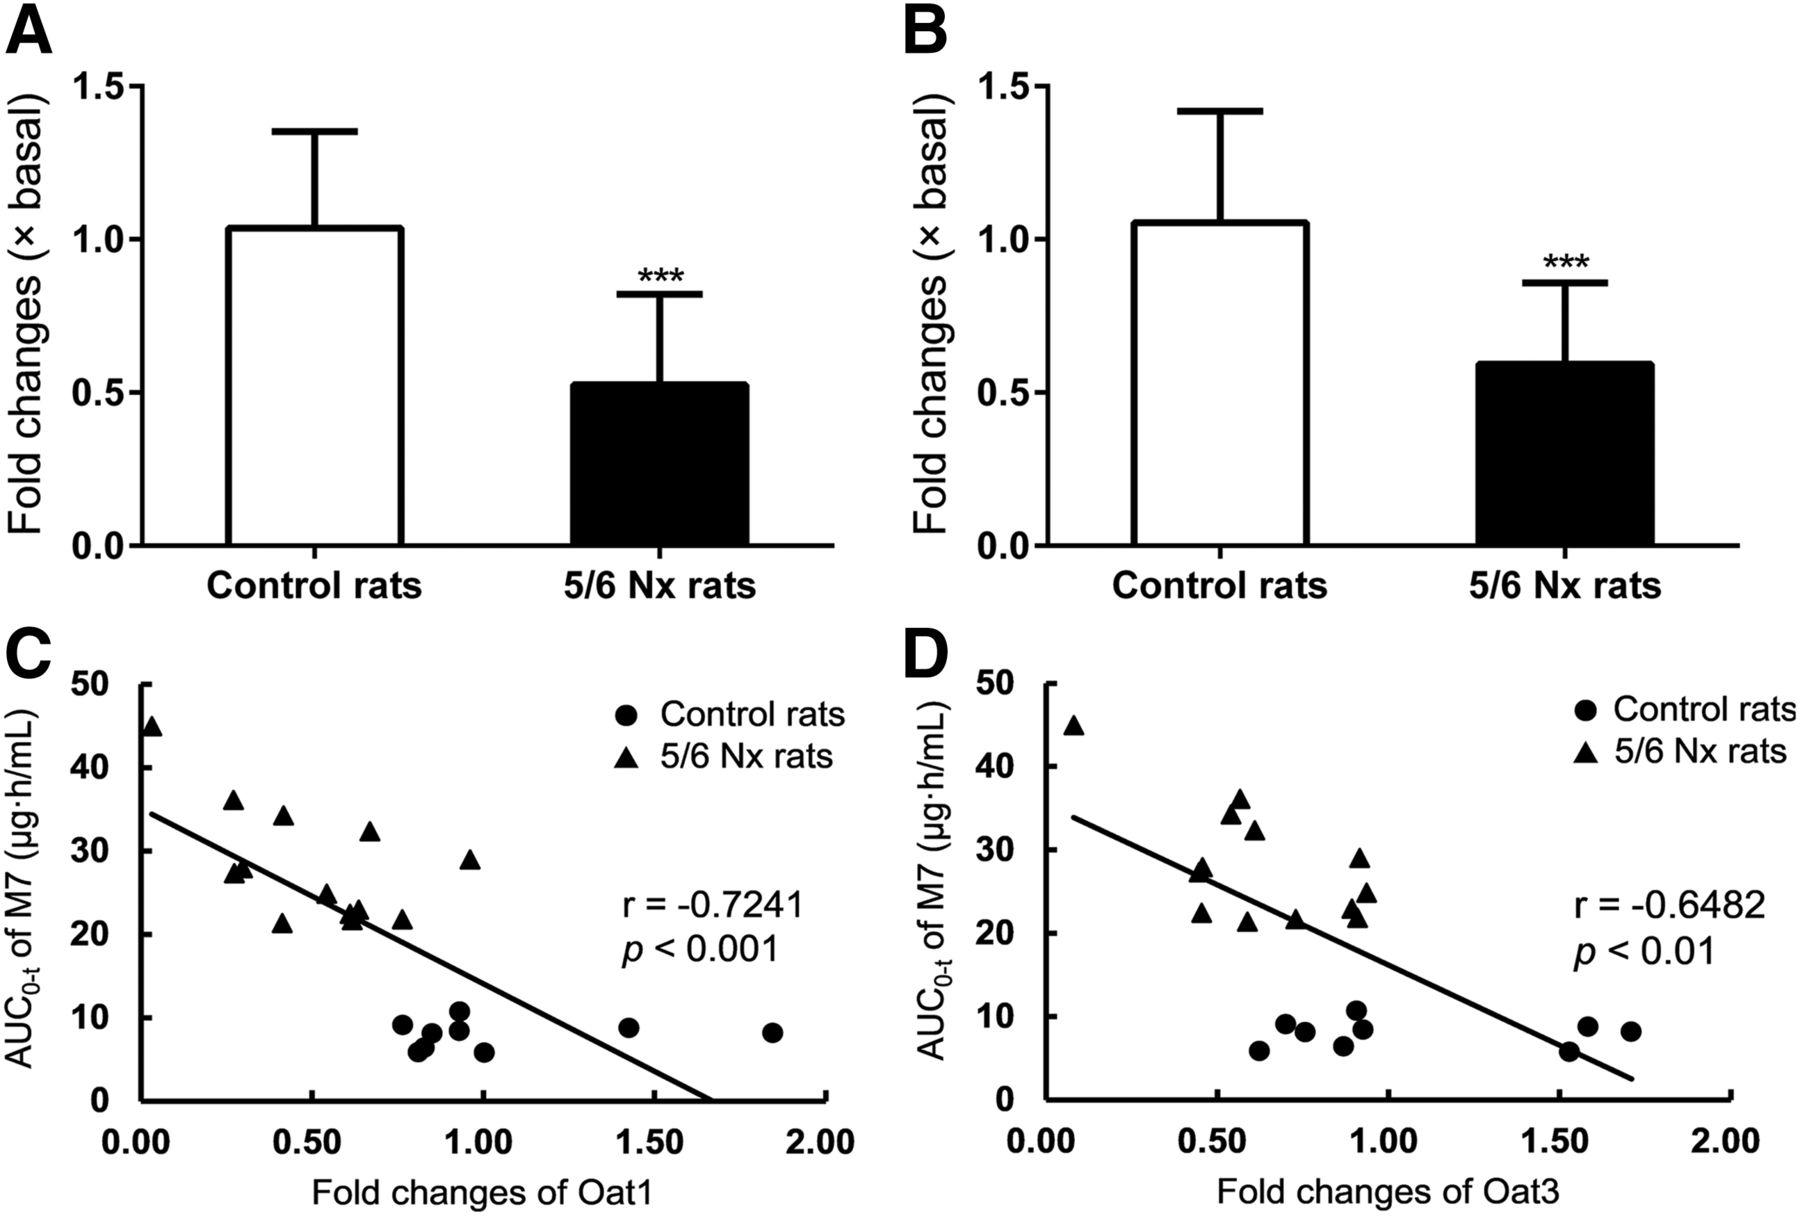 F6.large?width=800&height=600&carousel=1 increased plasma exposures of conjugated metabolites of 1980 MG MGB Wiring Diagrams at eliteediting.co